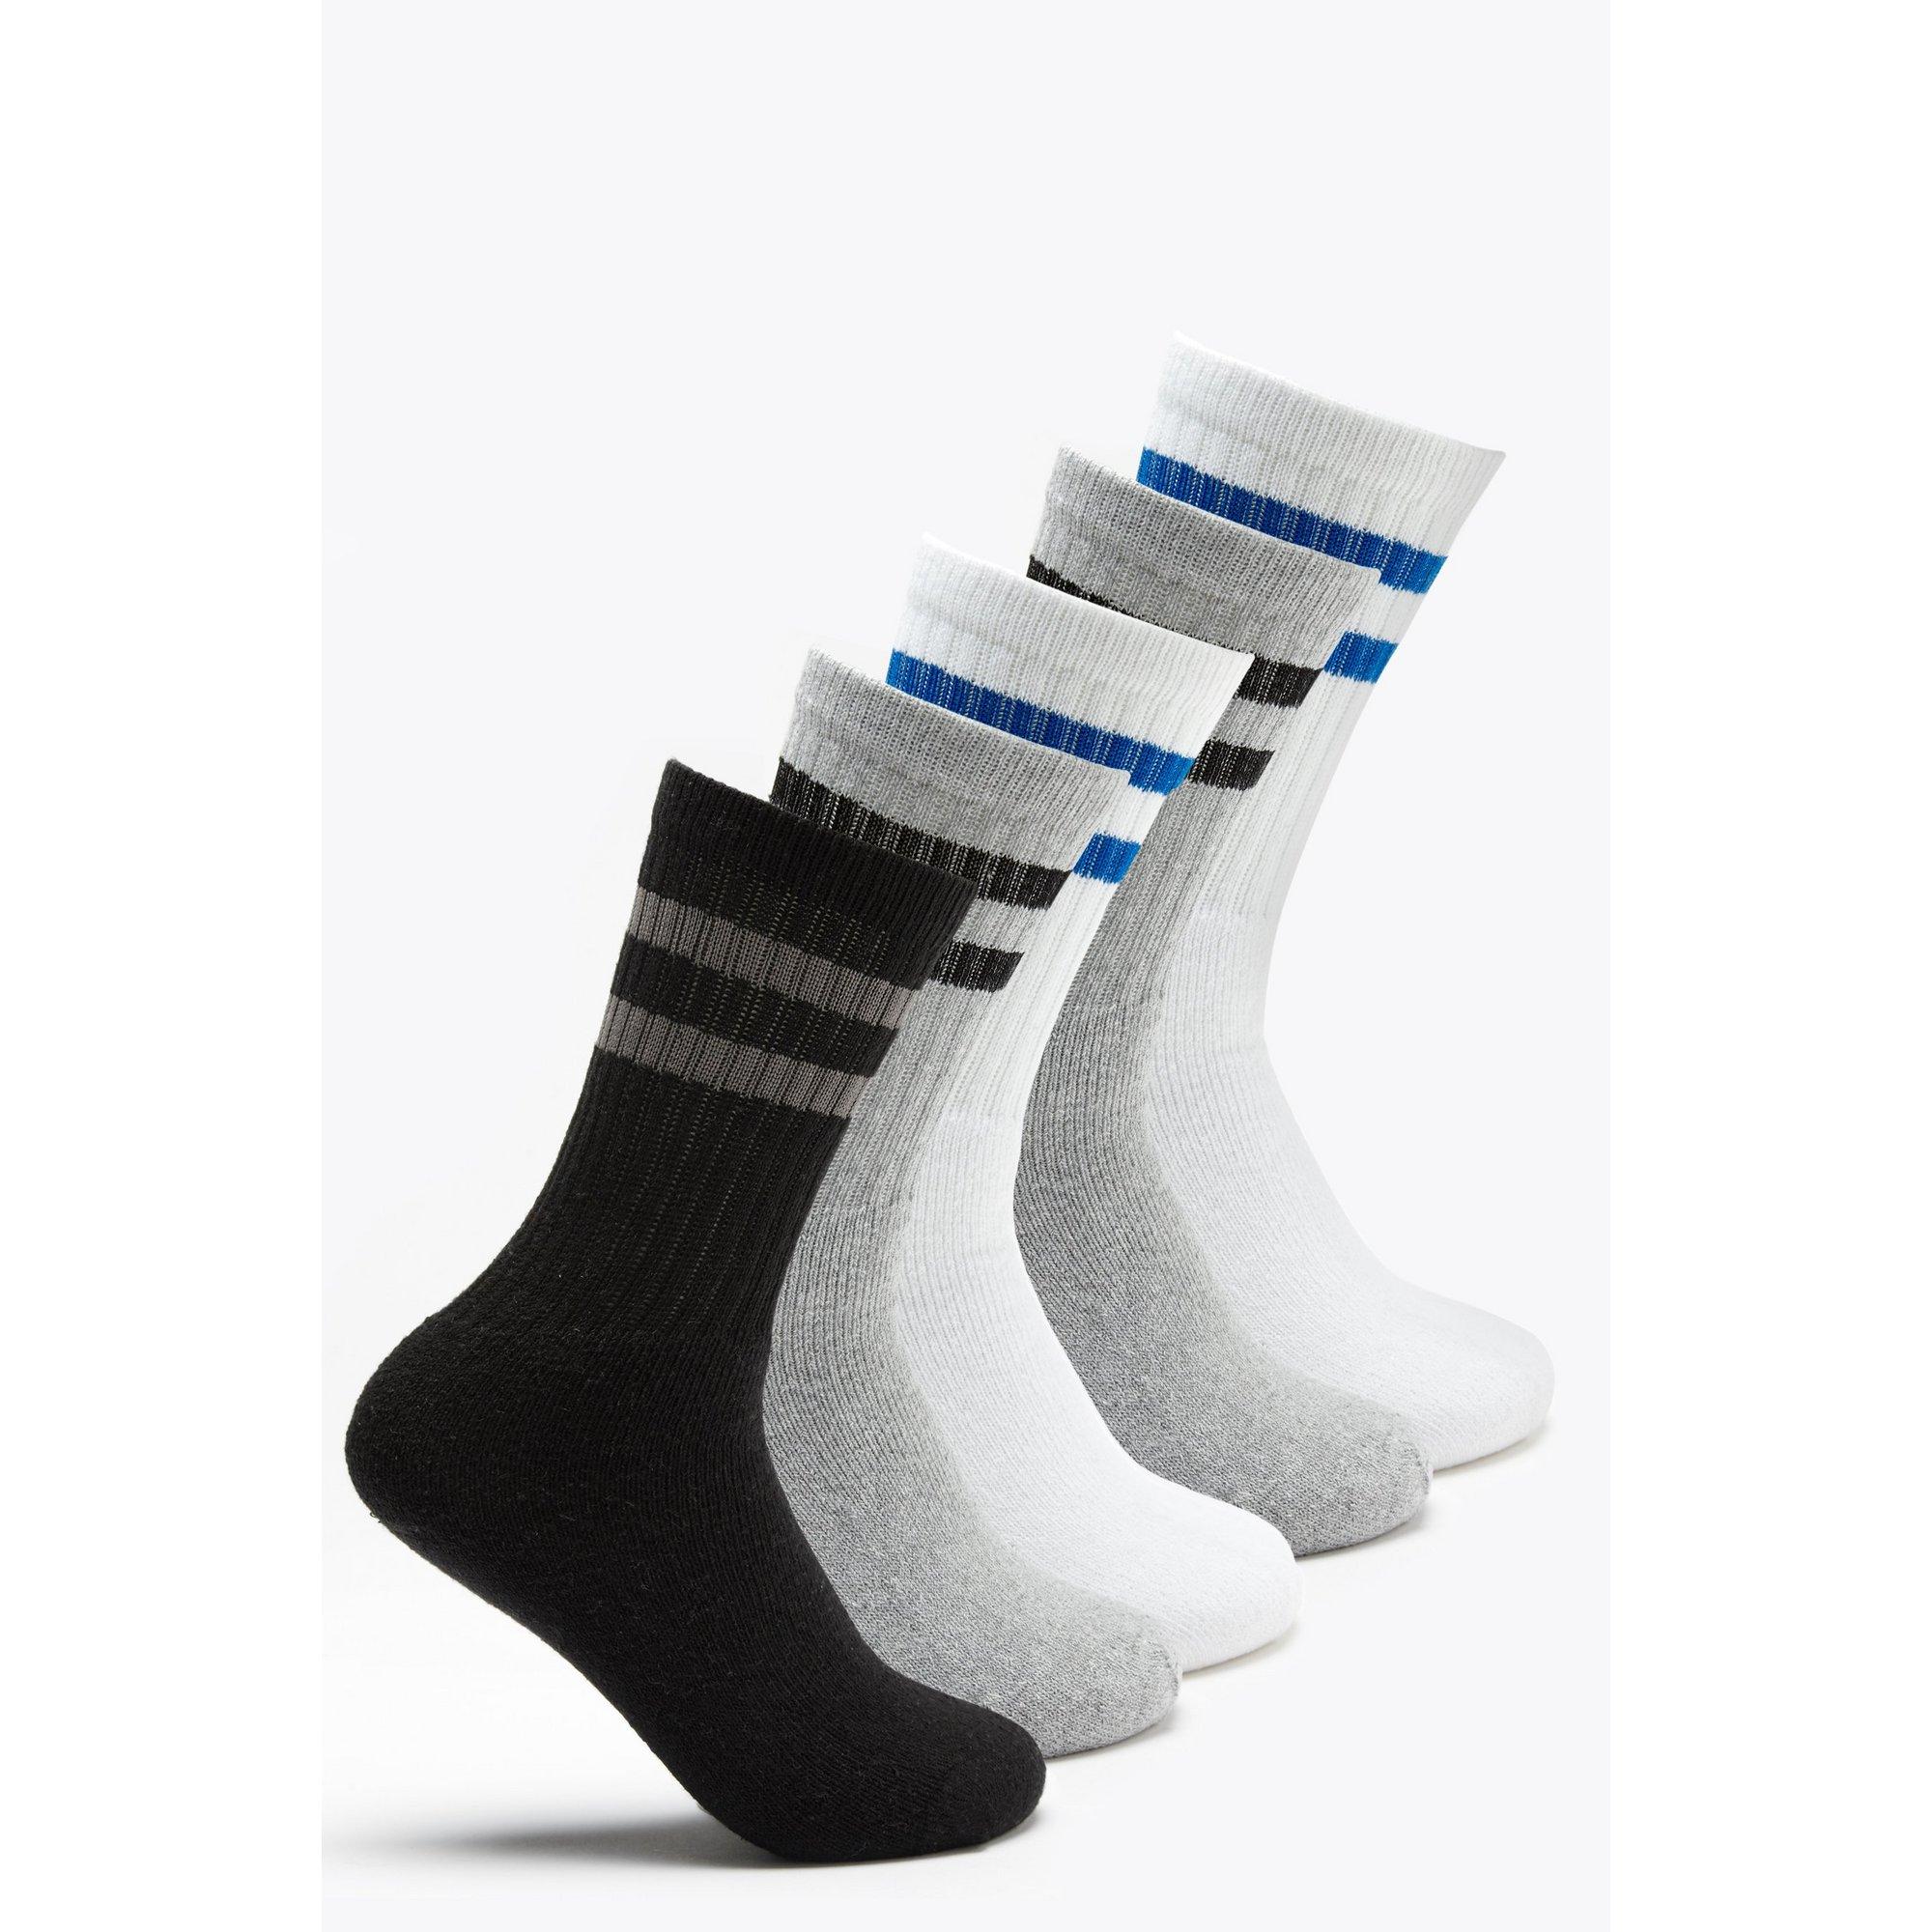 Image of 5 Pack Fashion Sport Socks